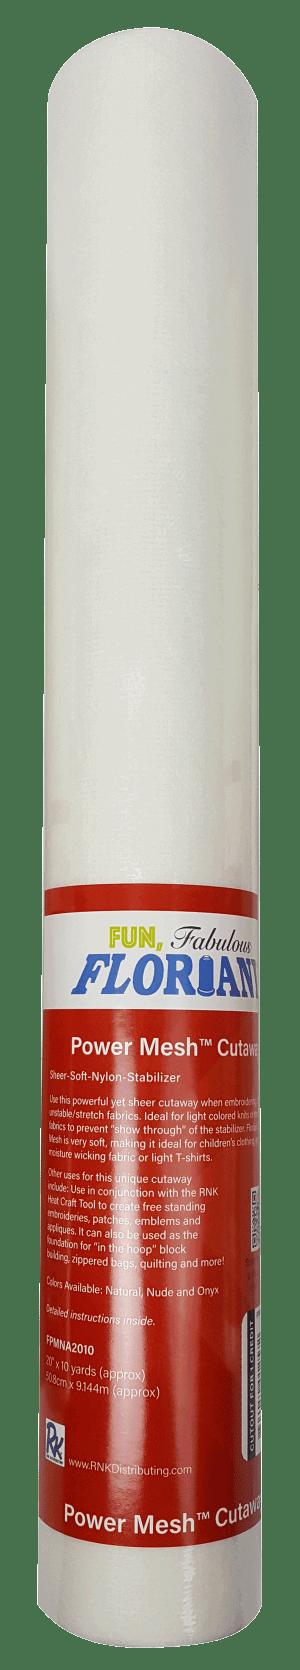 "Floriani Power Mesh Cutaway Natural 20""x10yds Stabilizer"